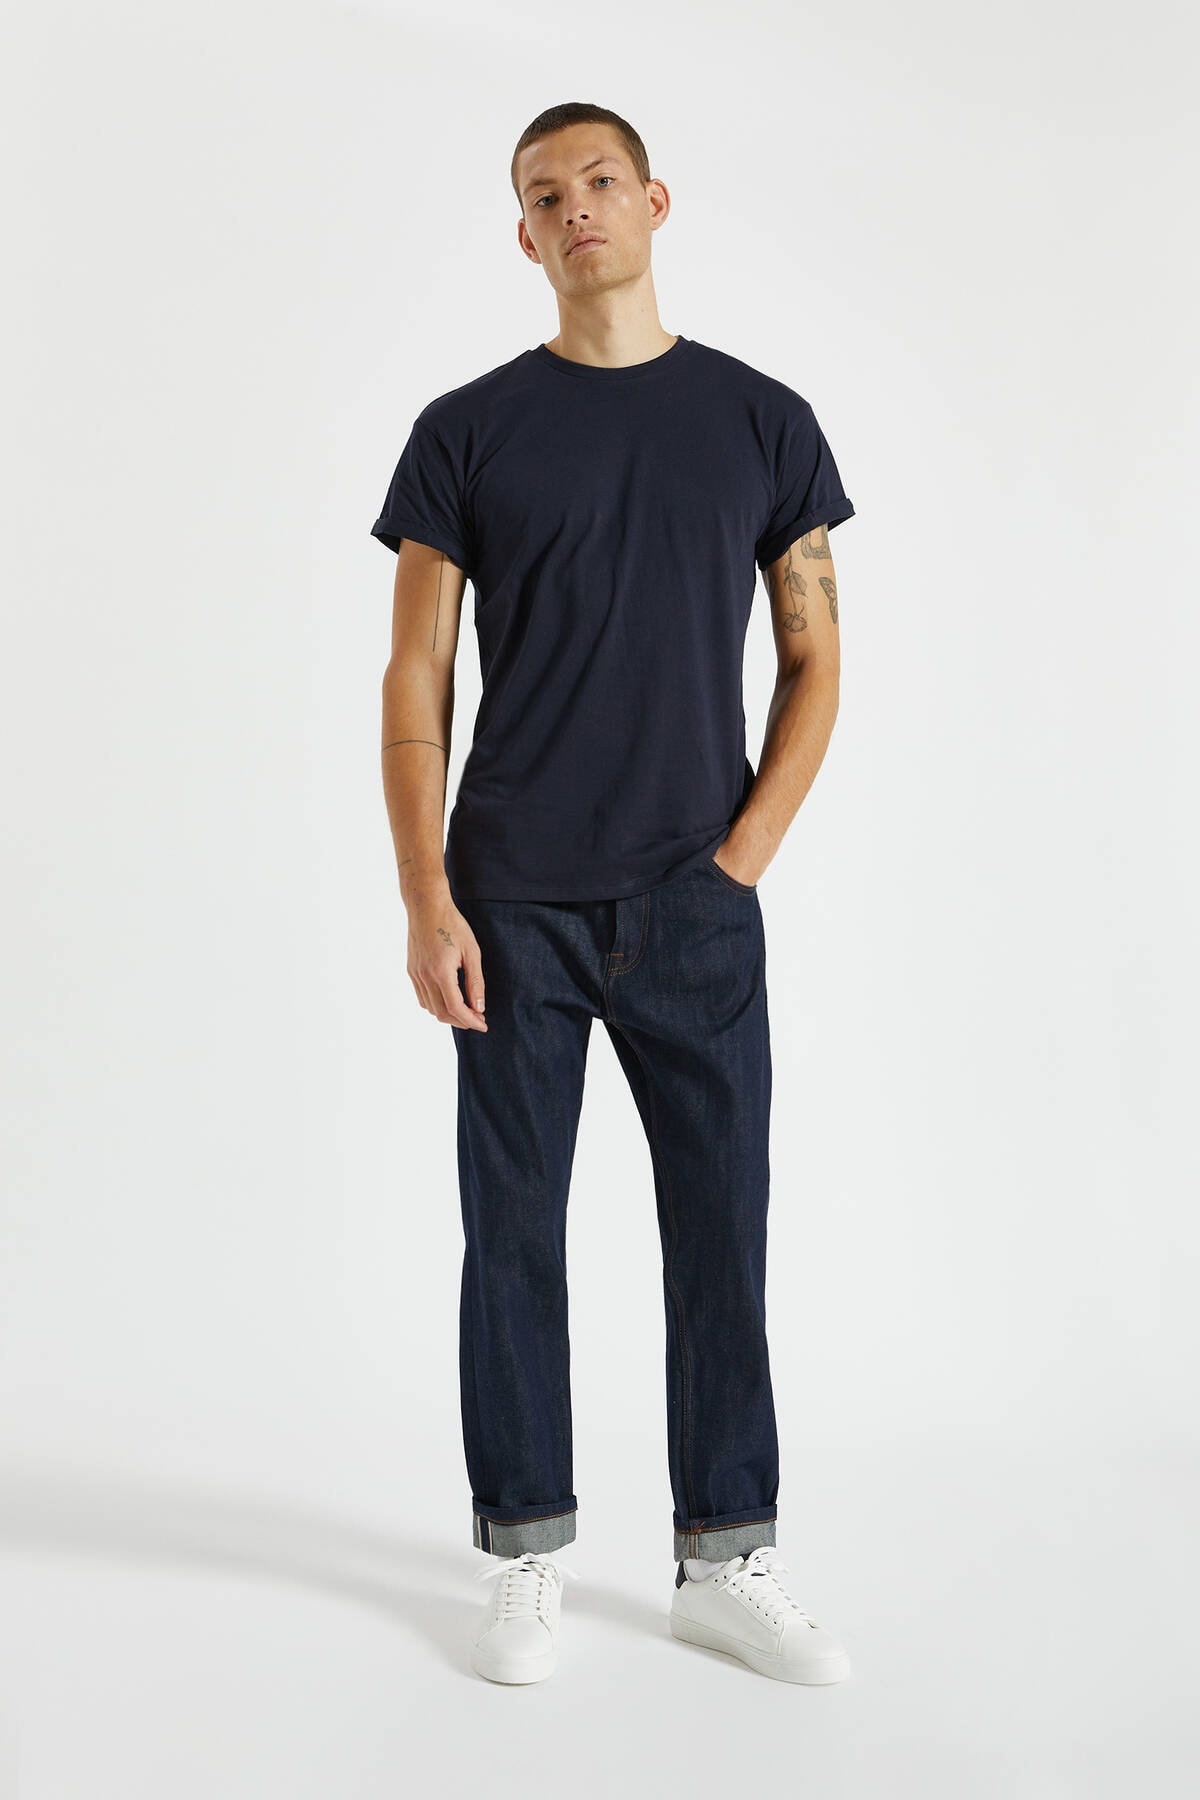 Pull & Bear Erkek Lacivert Logolu Basic Muscle Fit T-Shirt 09244941 1